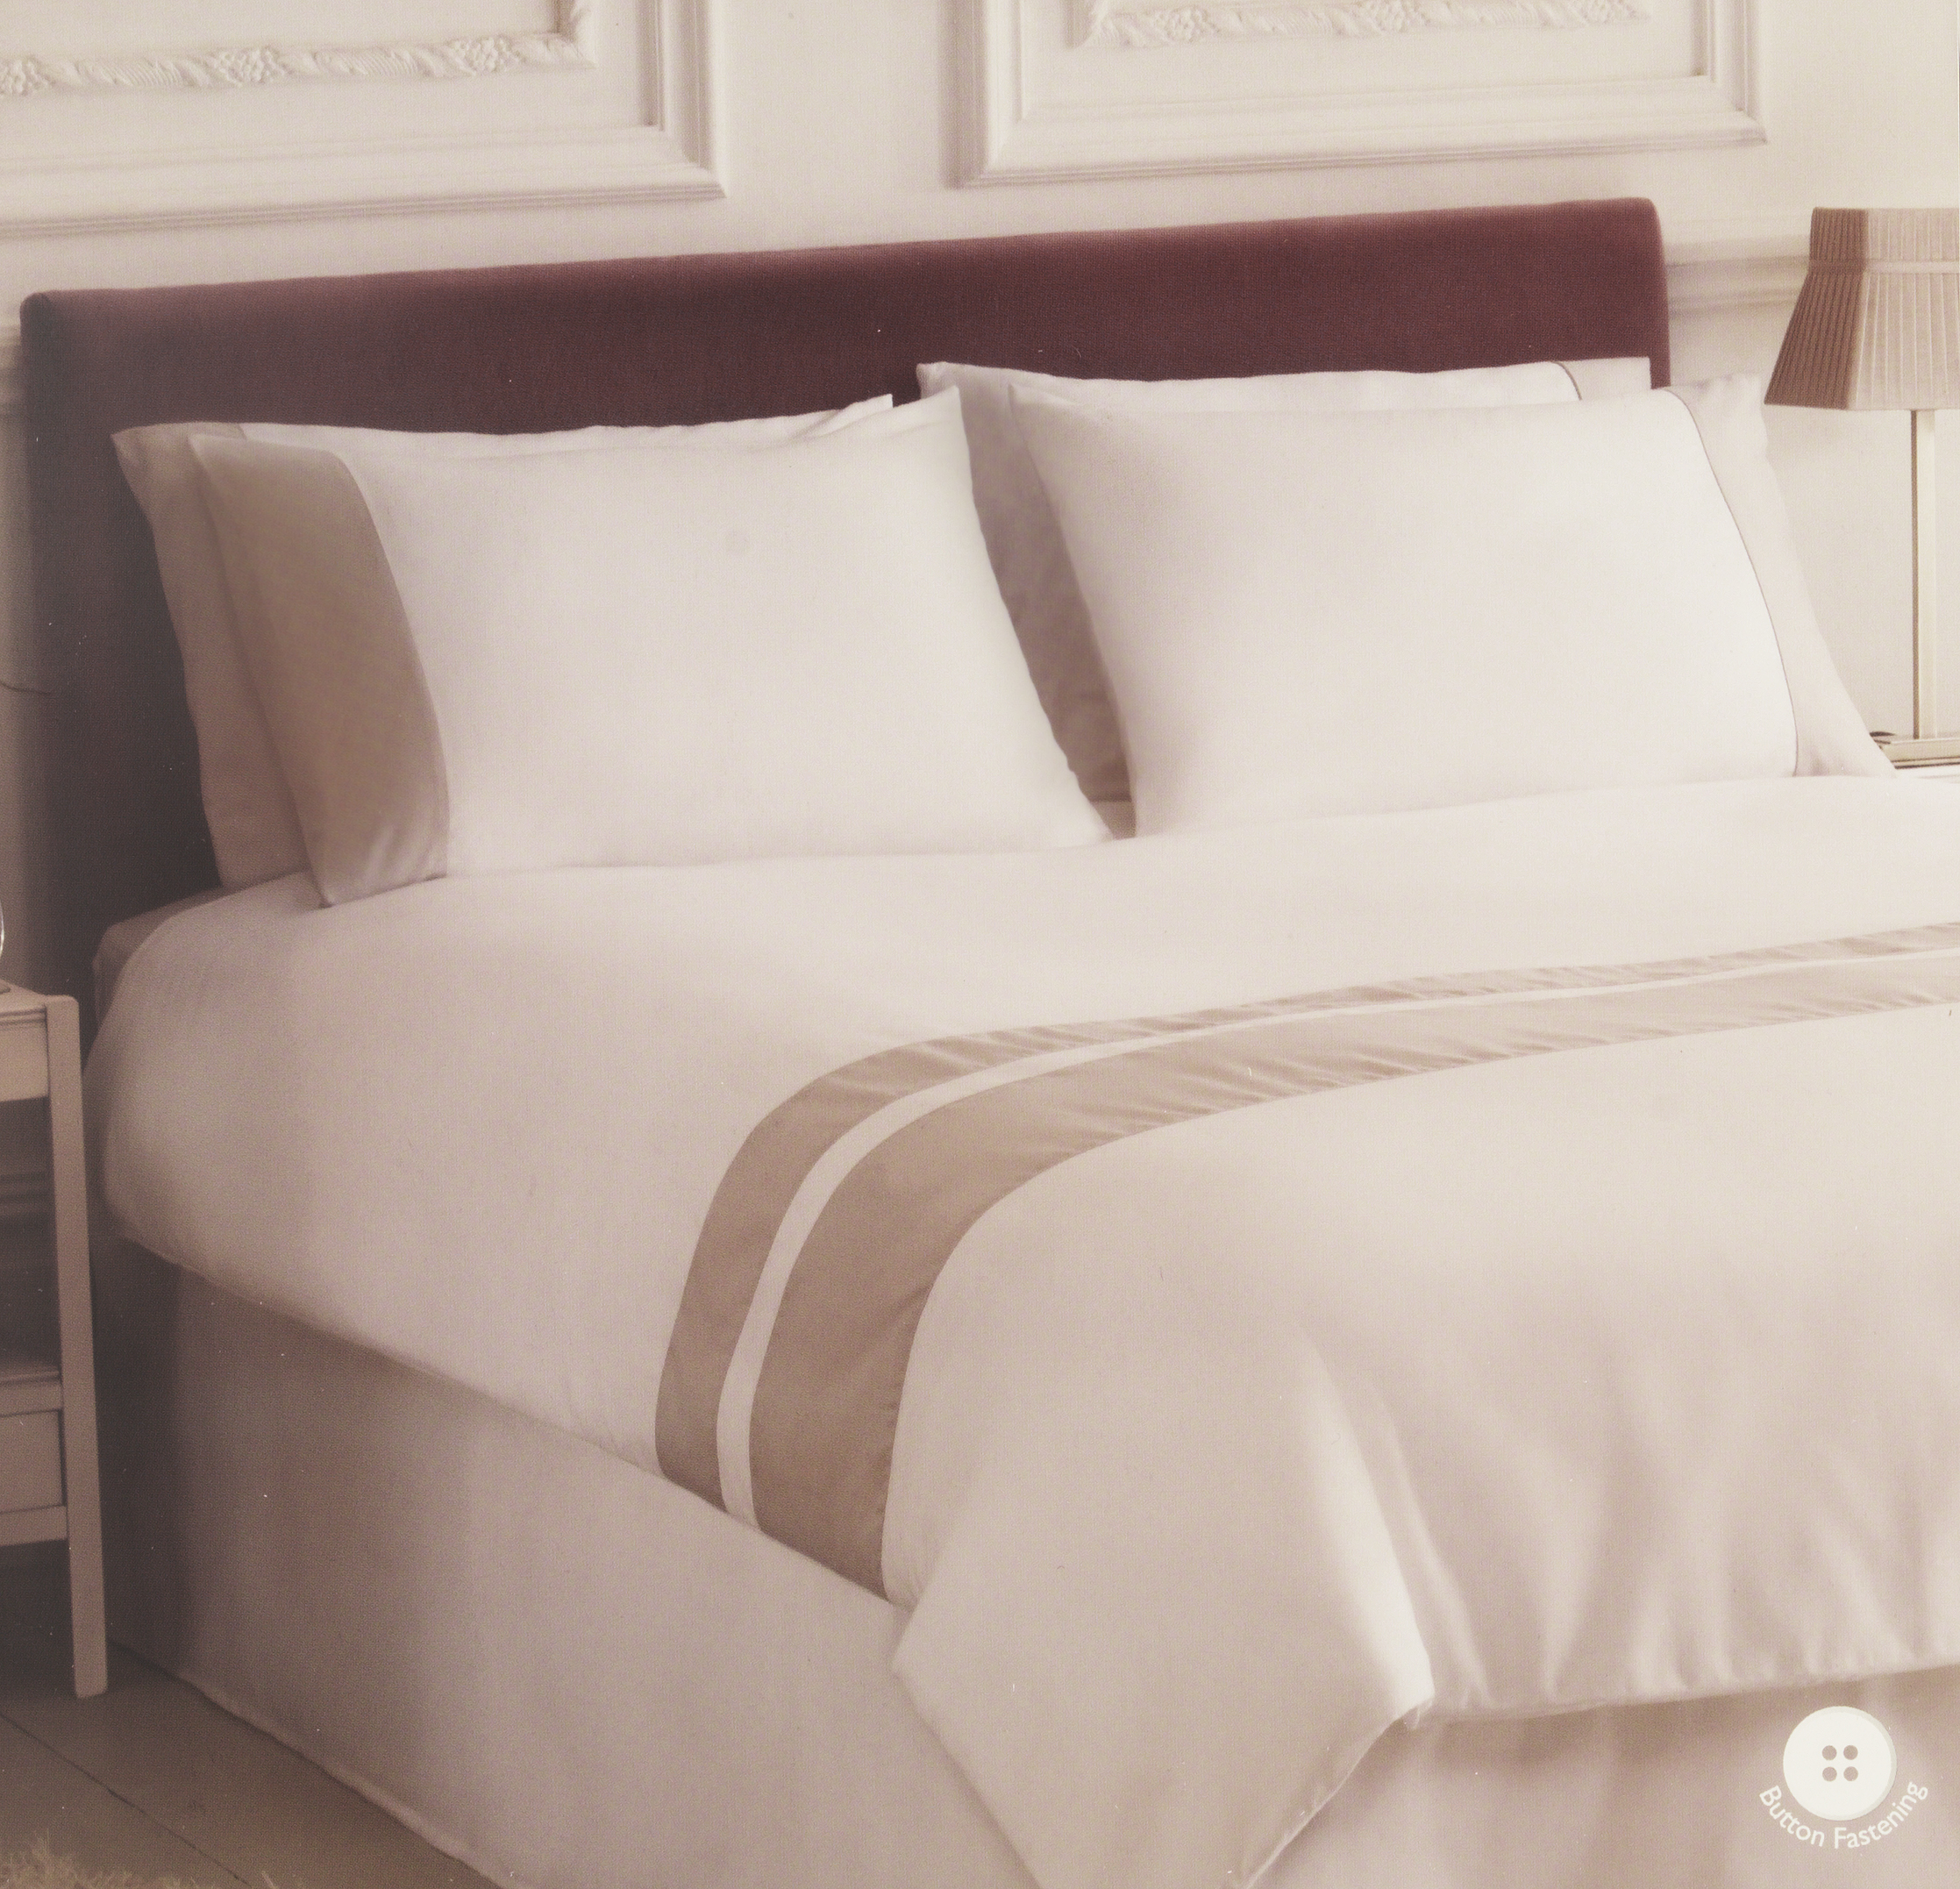 Frette milano double cotton duvet cover 200cm x 210cm for Frette milano